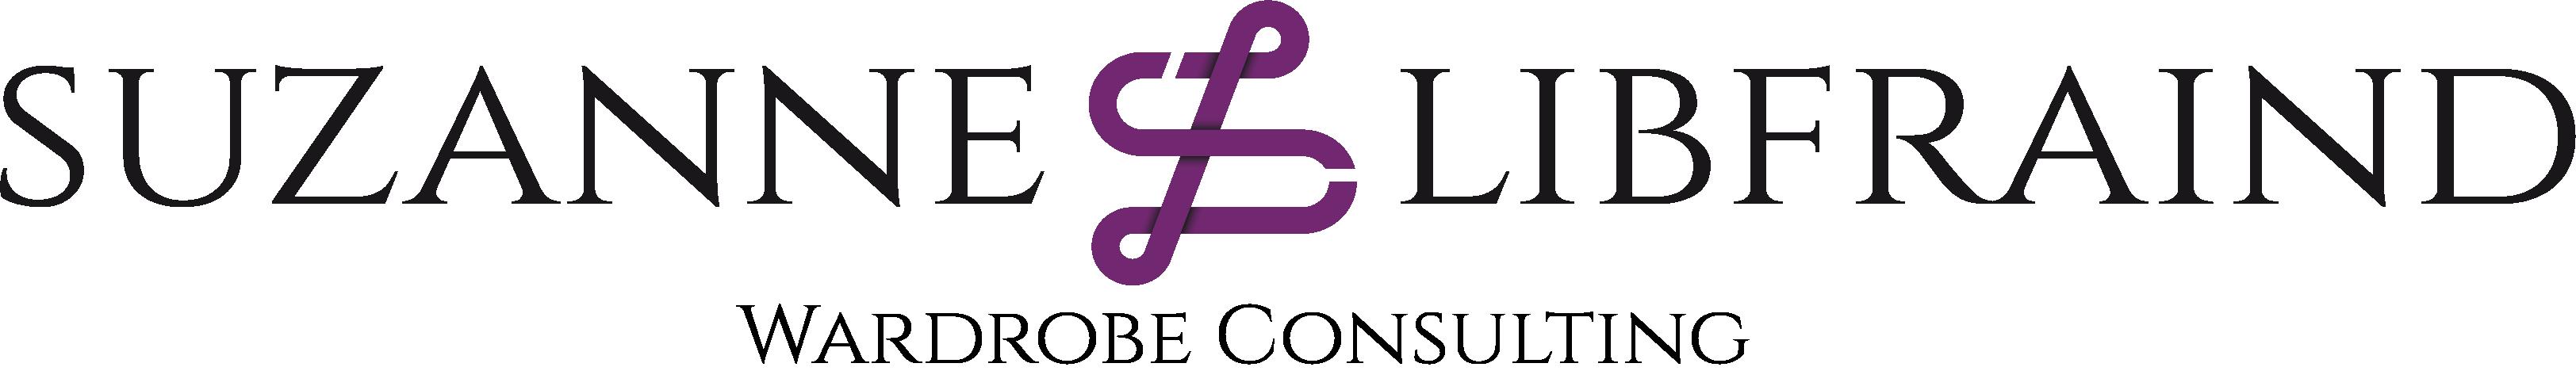 http://wardrobeconsulting.biz/wp-content/uploads/2019/05/suzannelibfraind4_logo.png